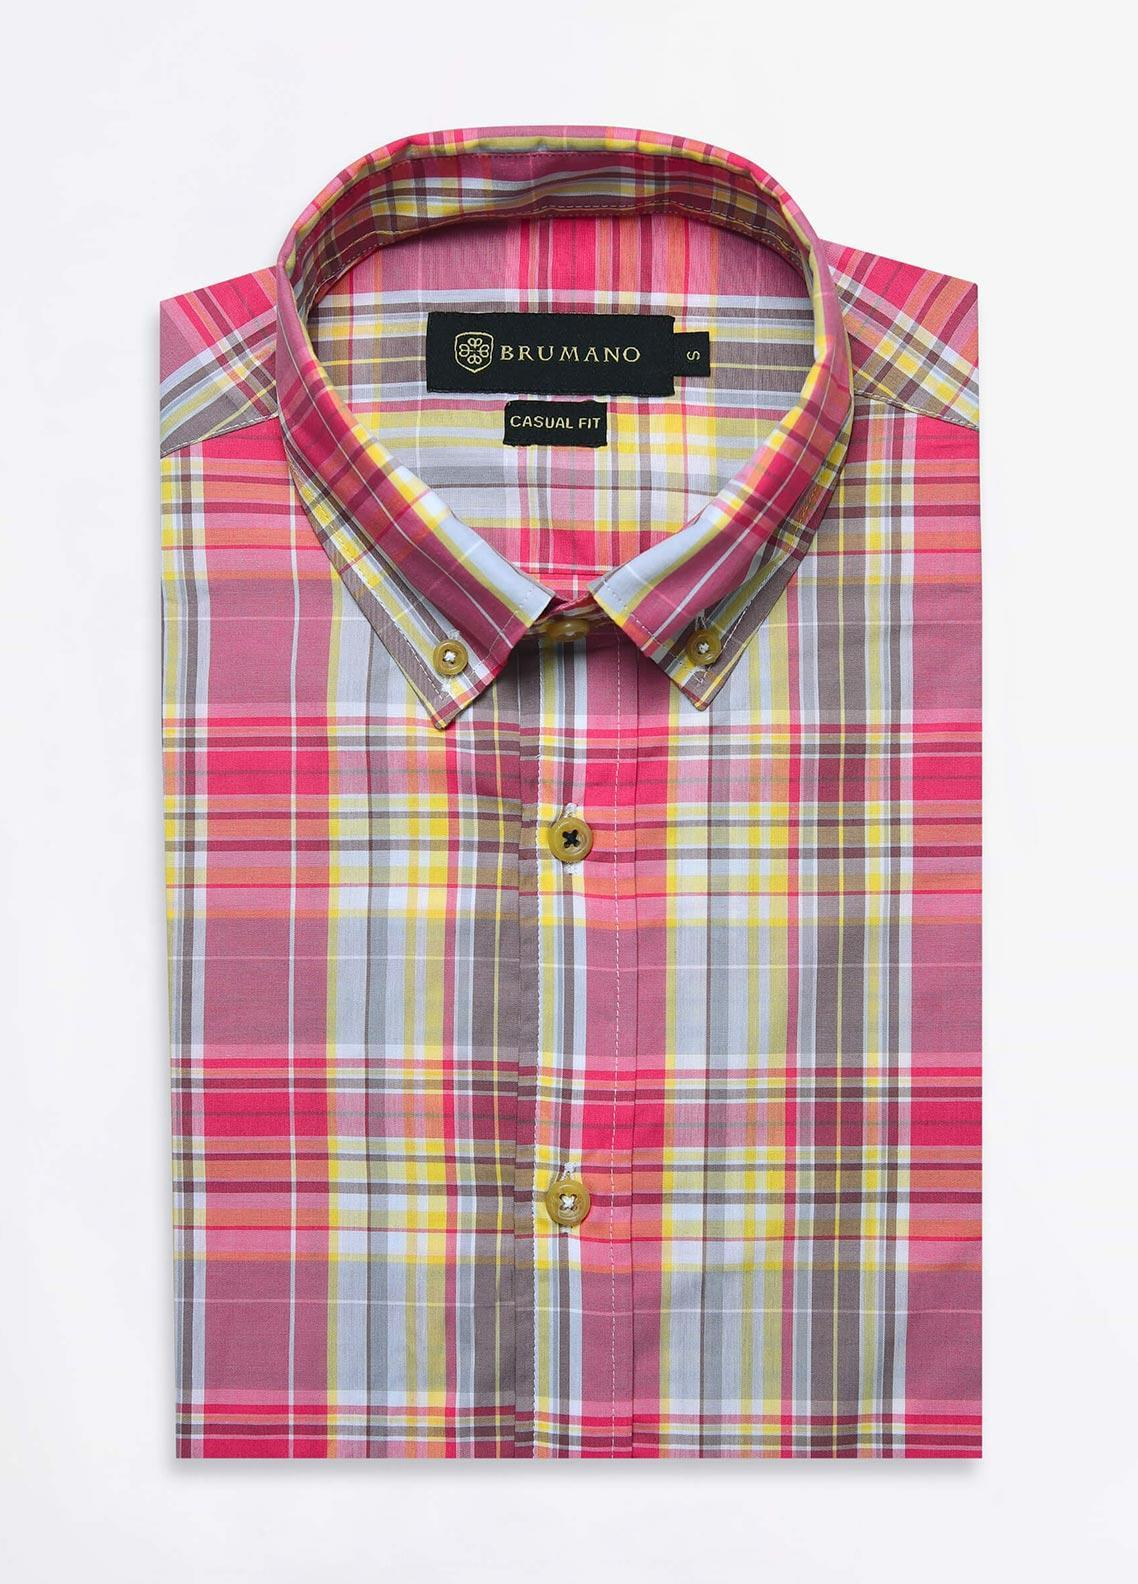 Brumano Cotton Formal Men Shirts -  BRM-1073